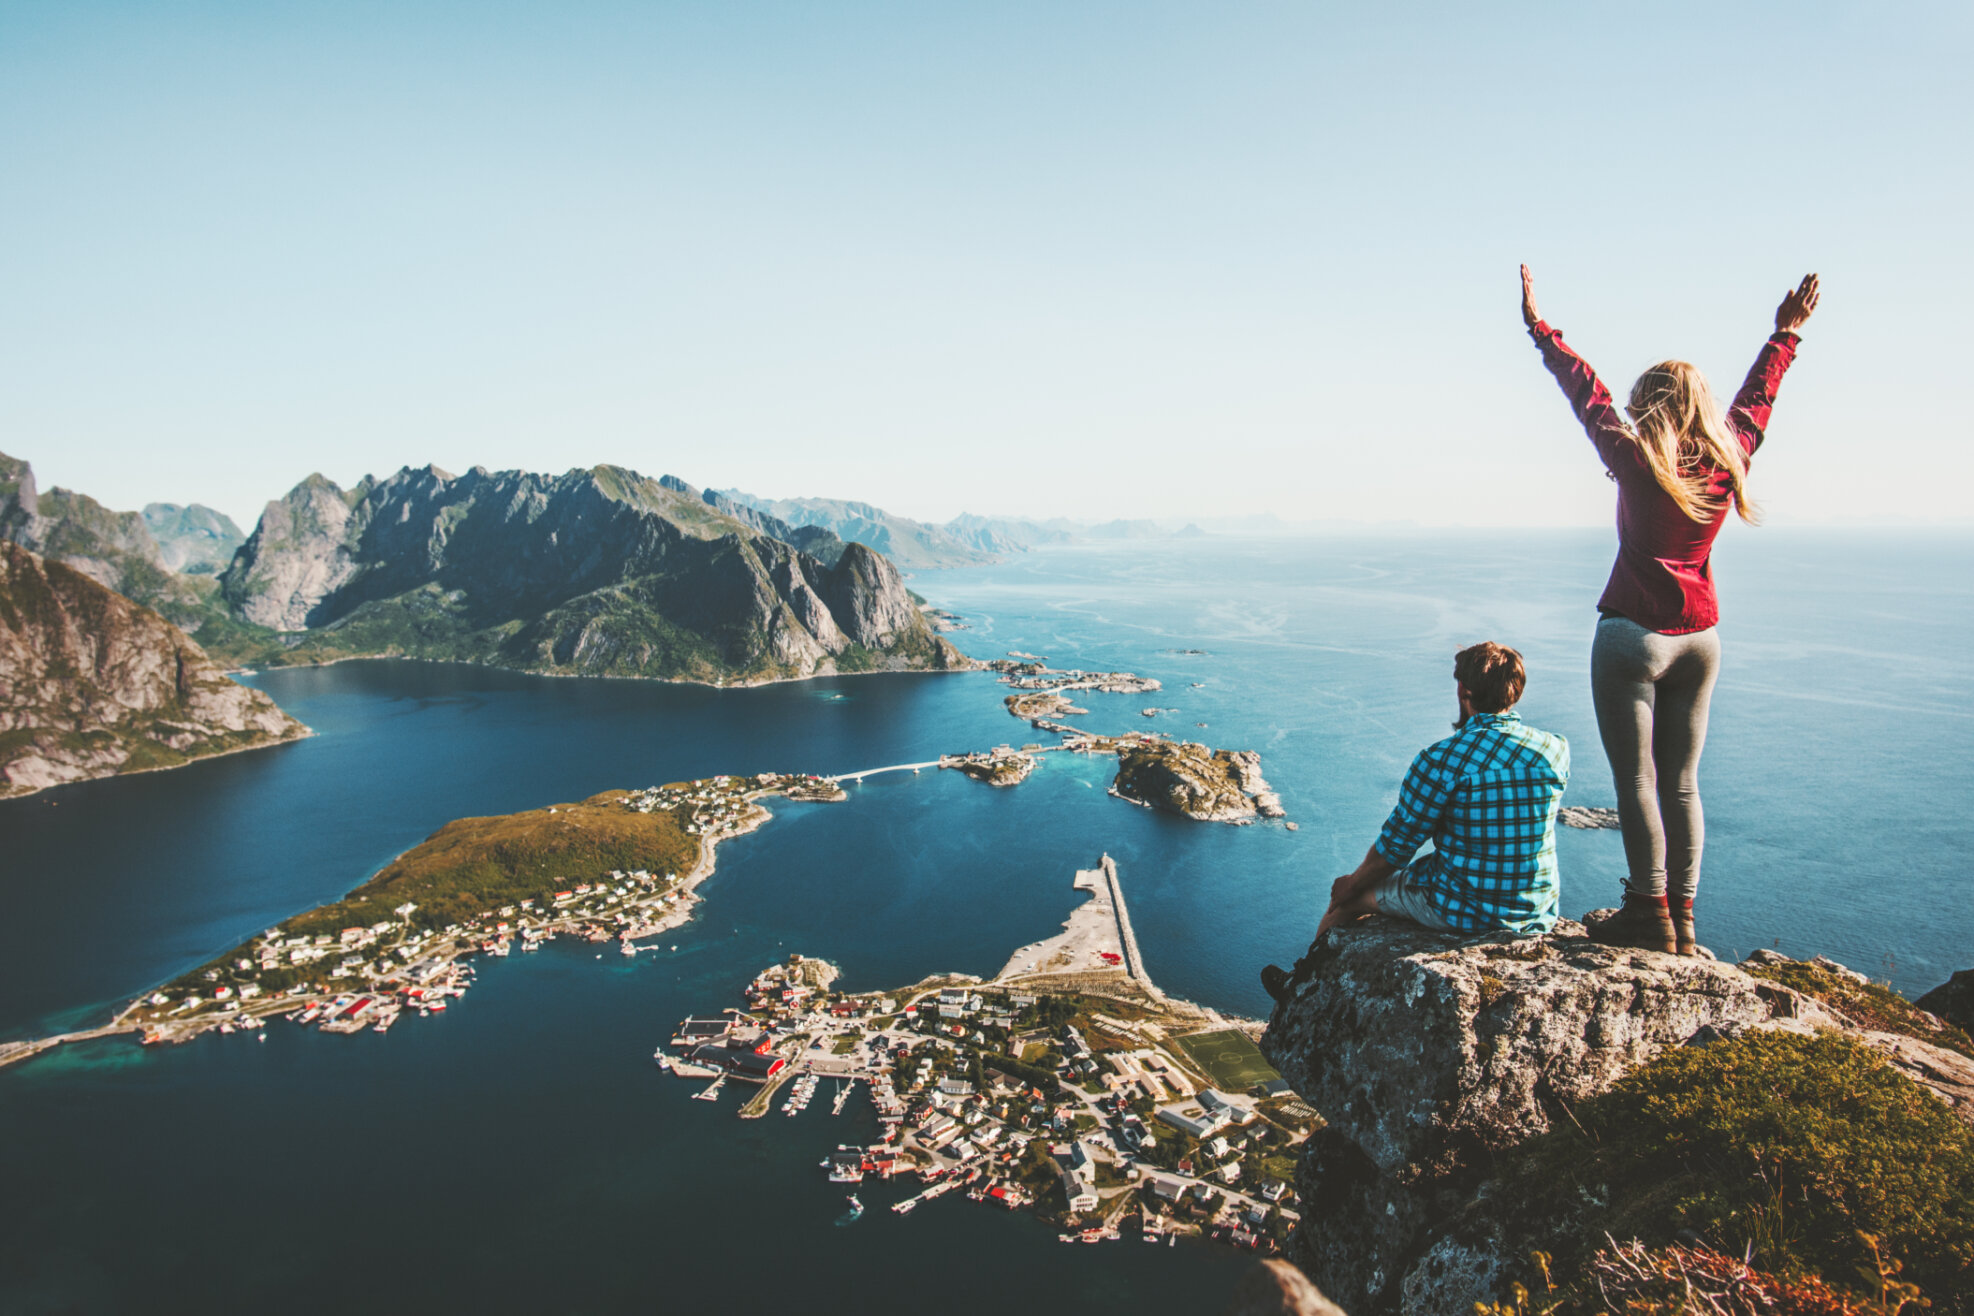 Vertikal-Helse-norgesferie-aktiv-ferie